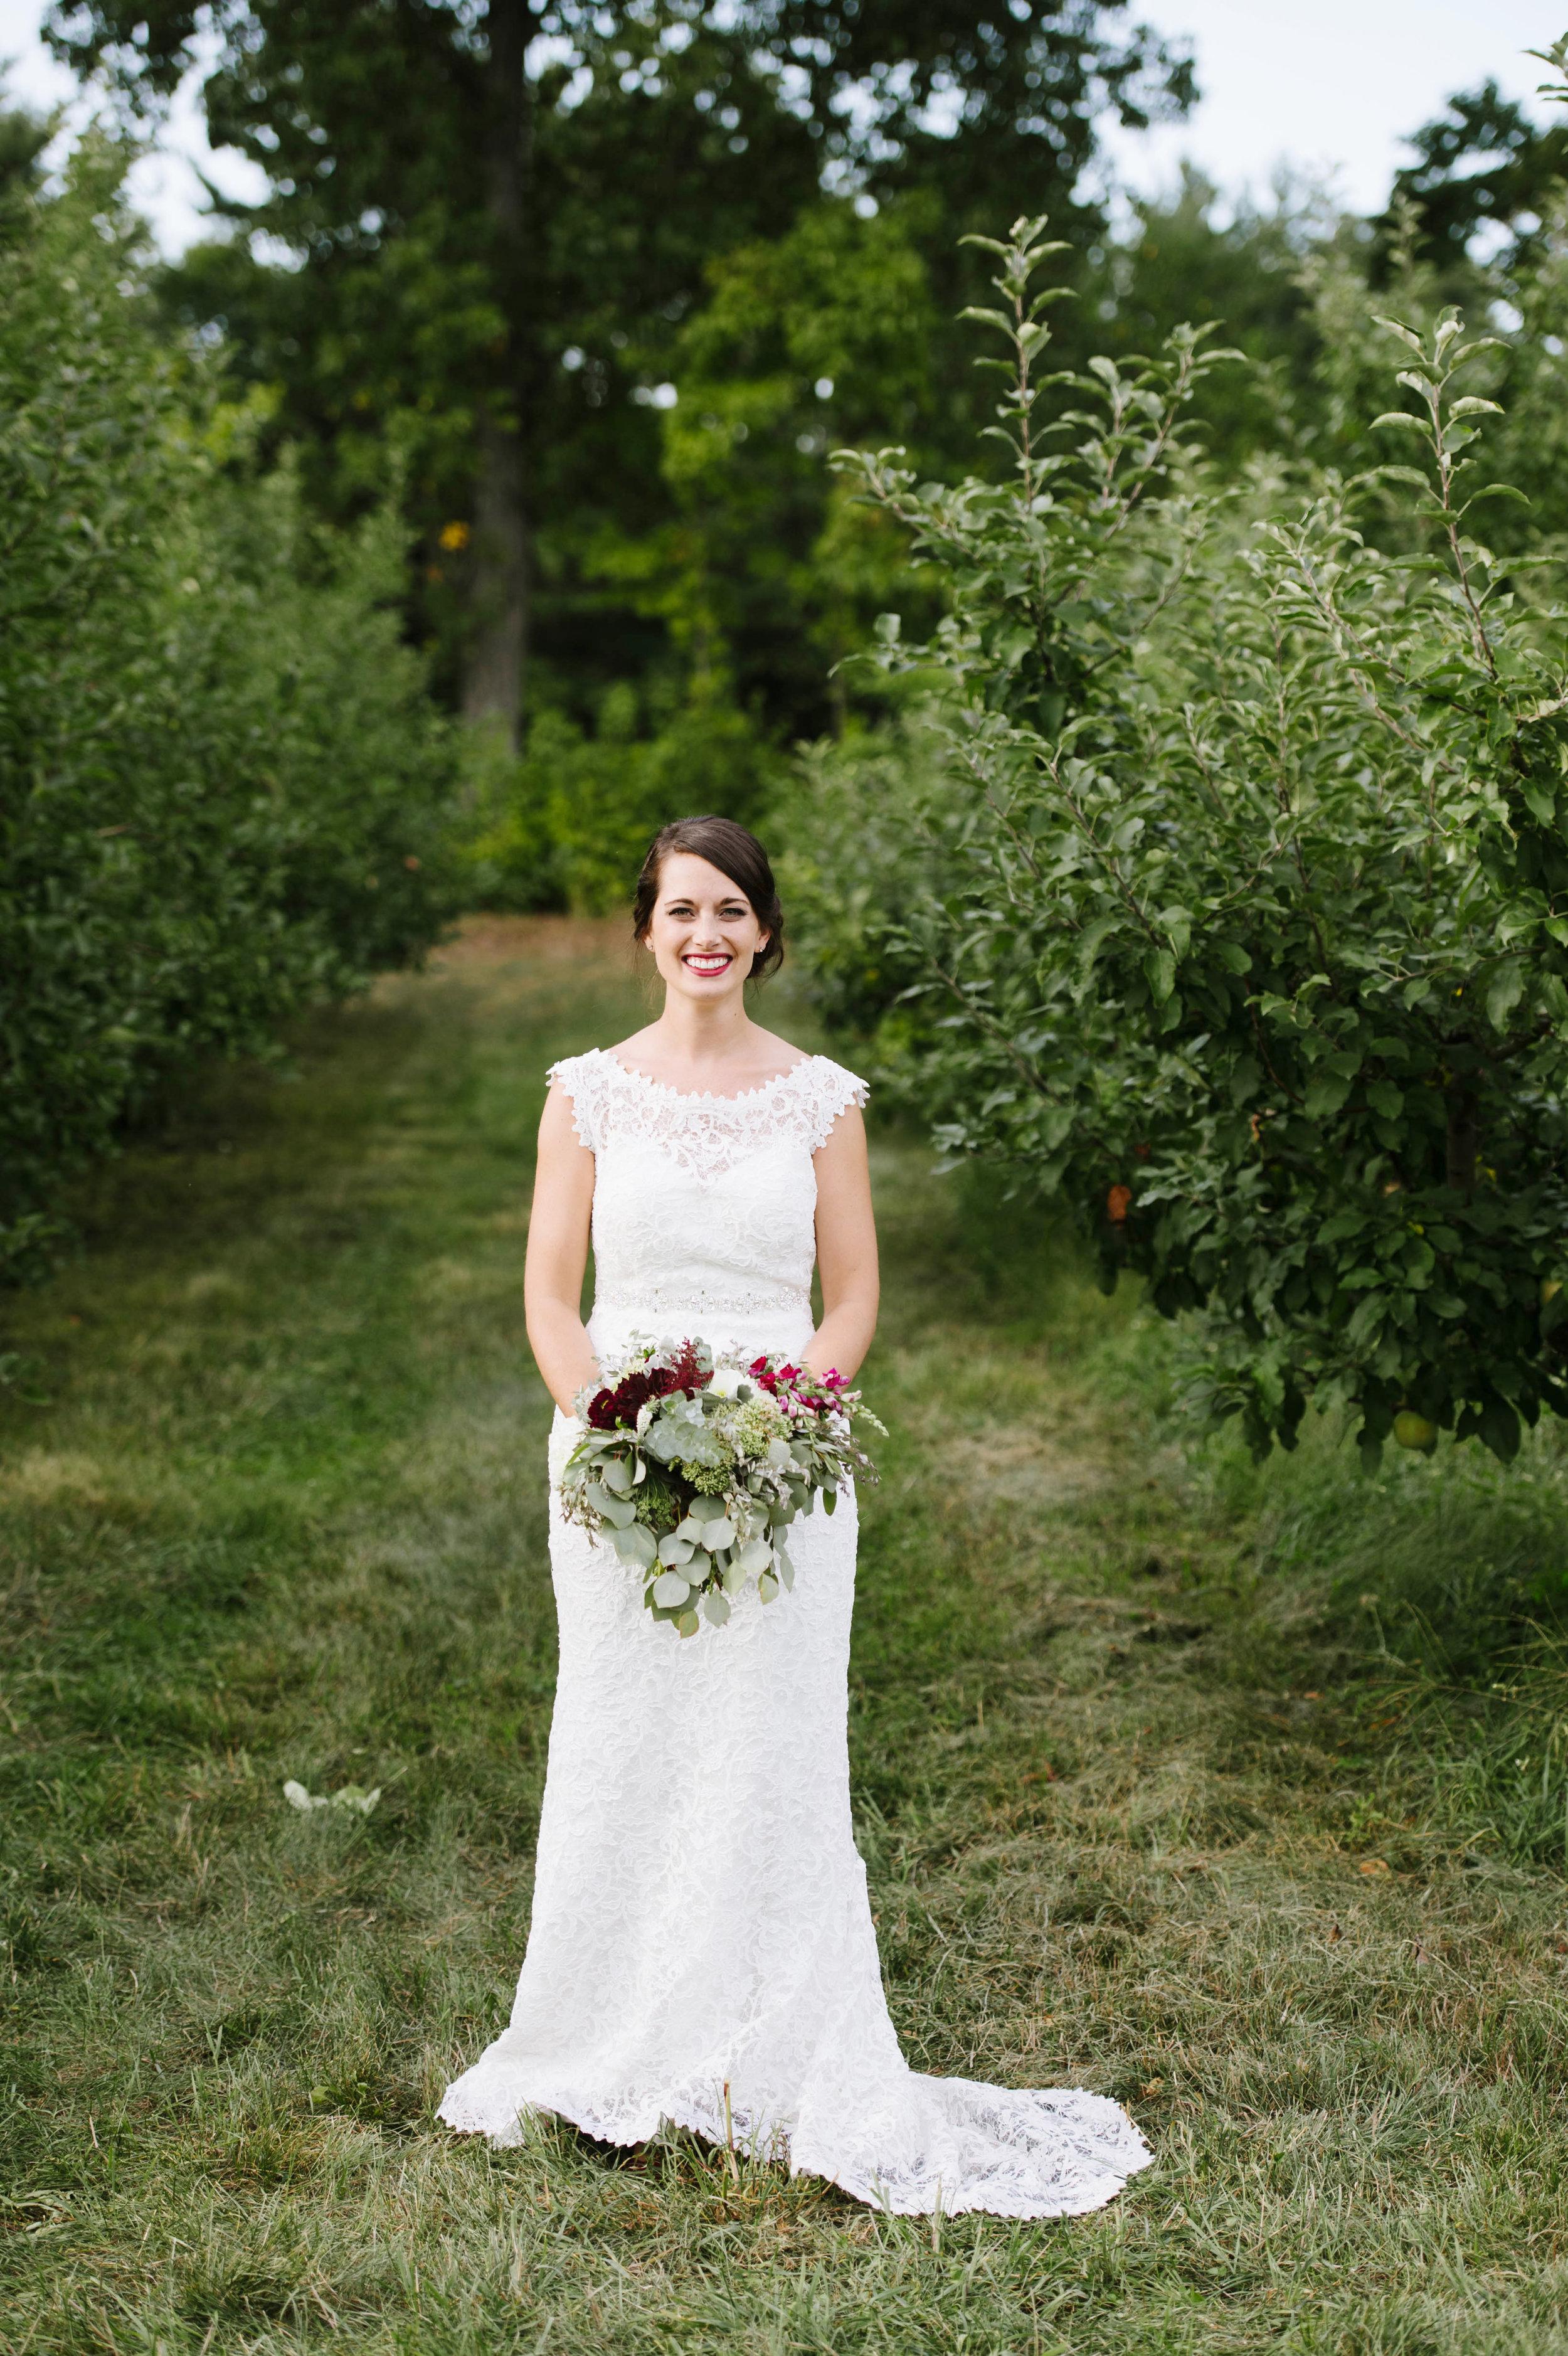 Candid-Wedding-Photography-Boston011.jpg